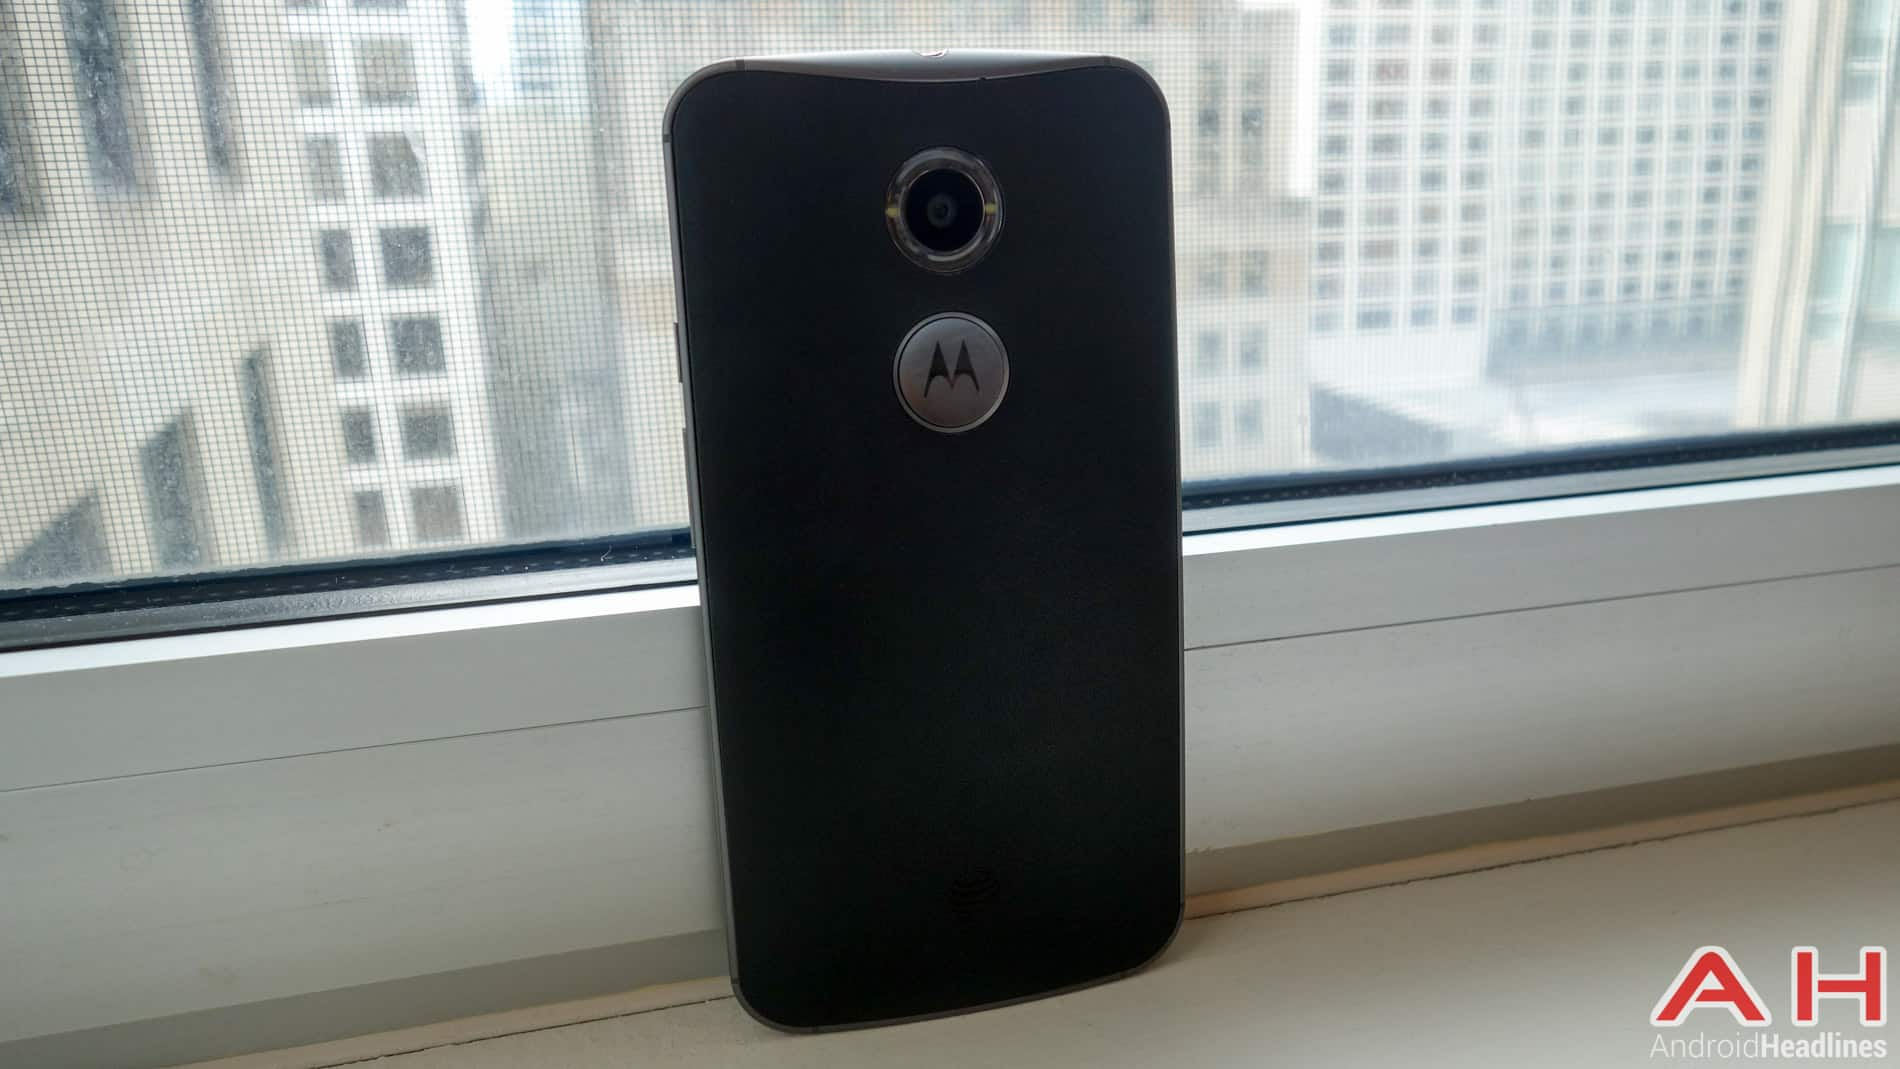 Motorola AH 258